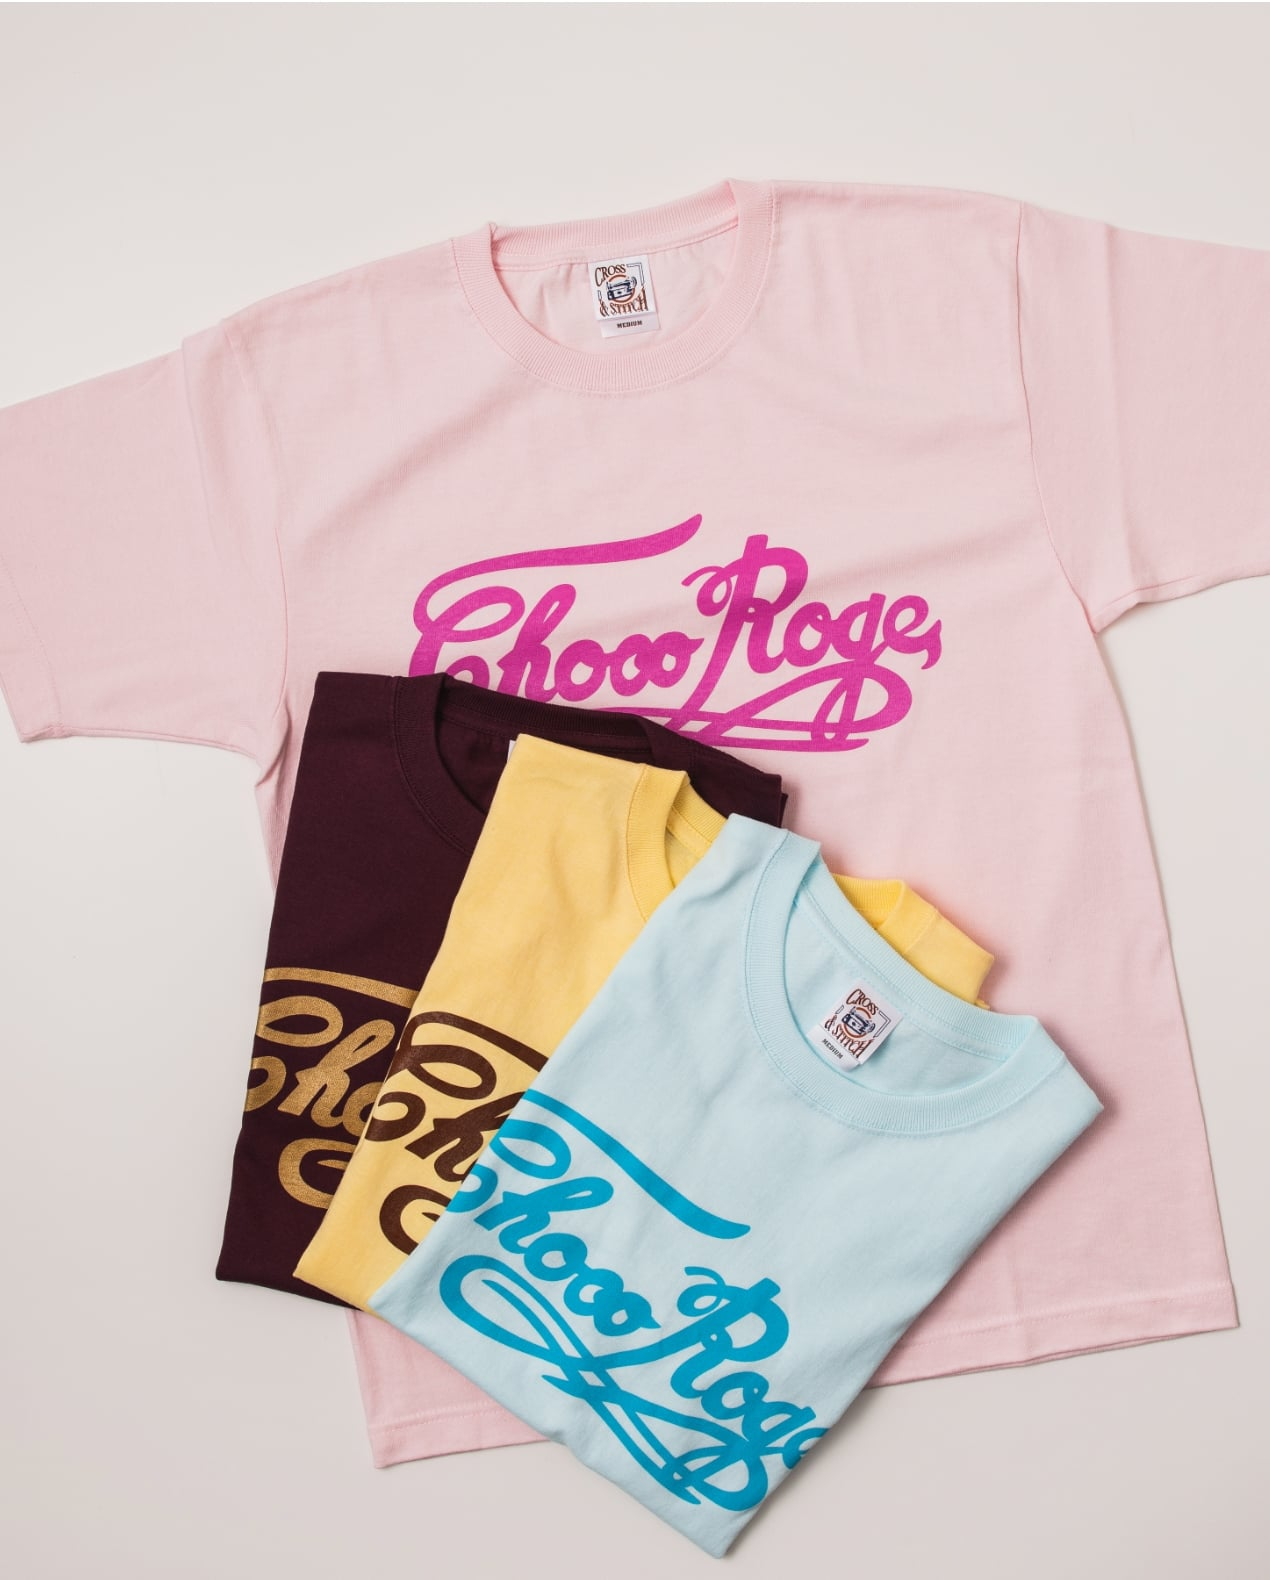 Tシャツ 子供用 ピンク サイズ140